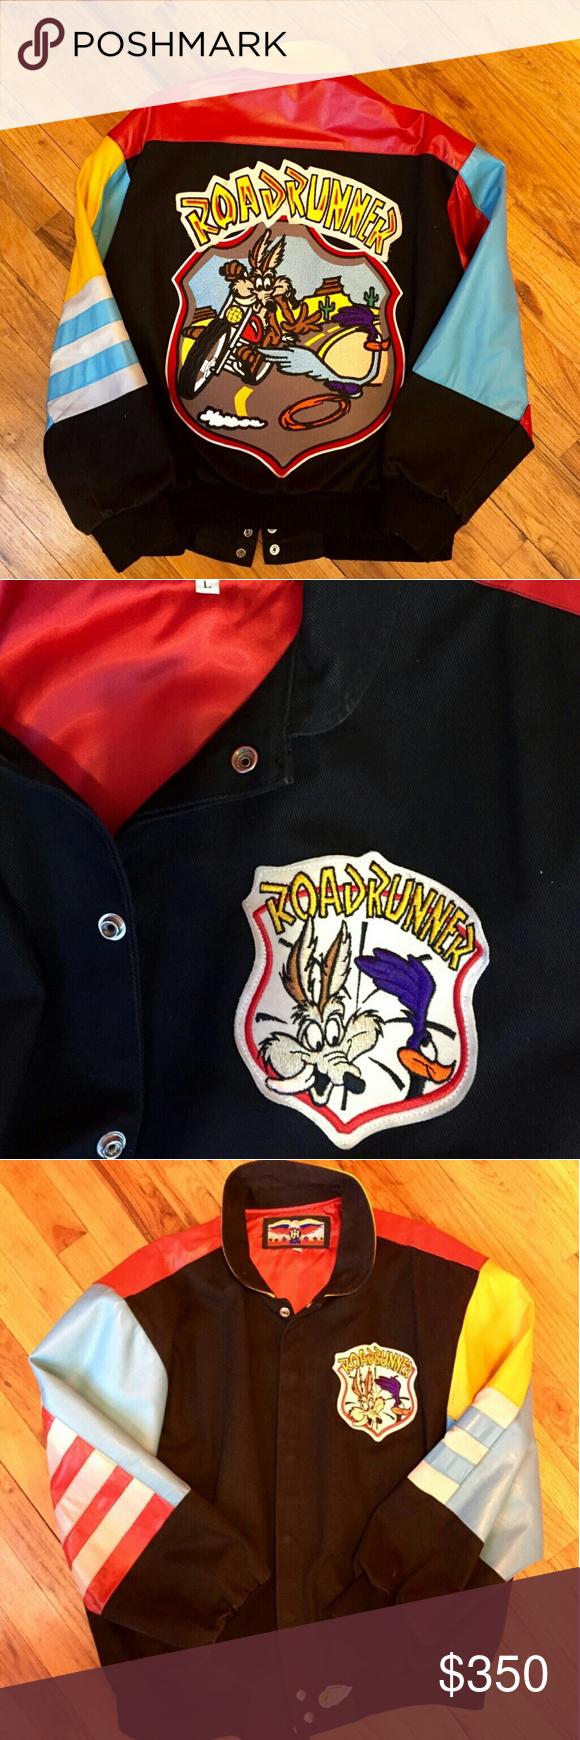 Vintage Jeff Hamilton Road Runner Leather Jacket Colorful Leather Jacket Leather Jacket Jackets [ 1740 x 580 Pixel ]